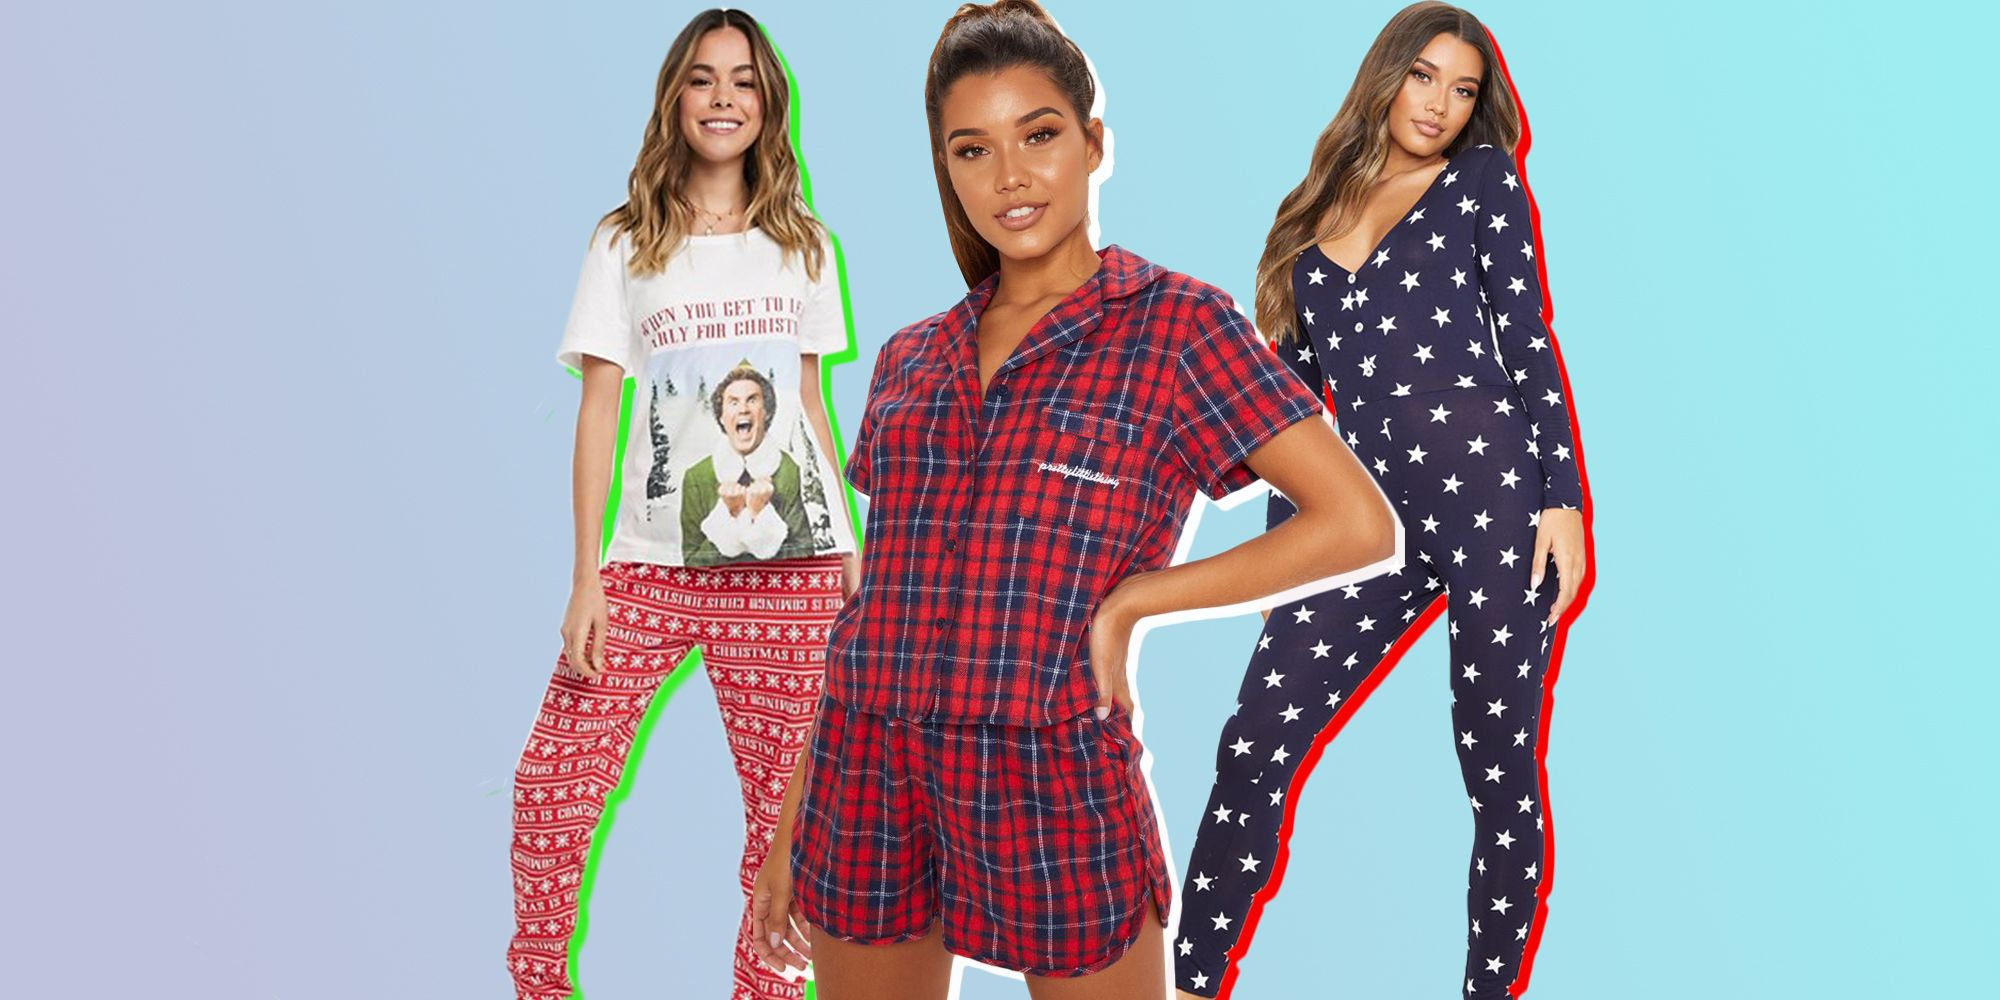 Disney Printed all over Ladies Nightdress Long T-shirt Nighty Women/'s Primark.